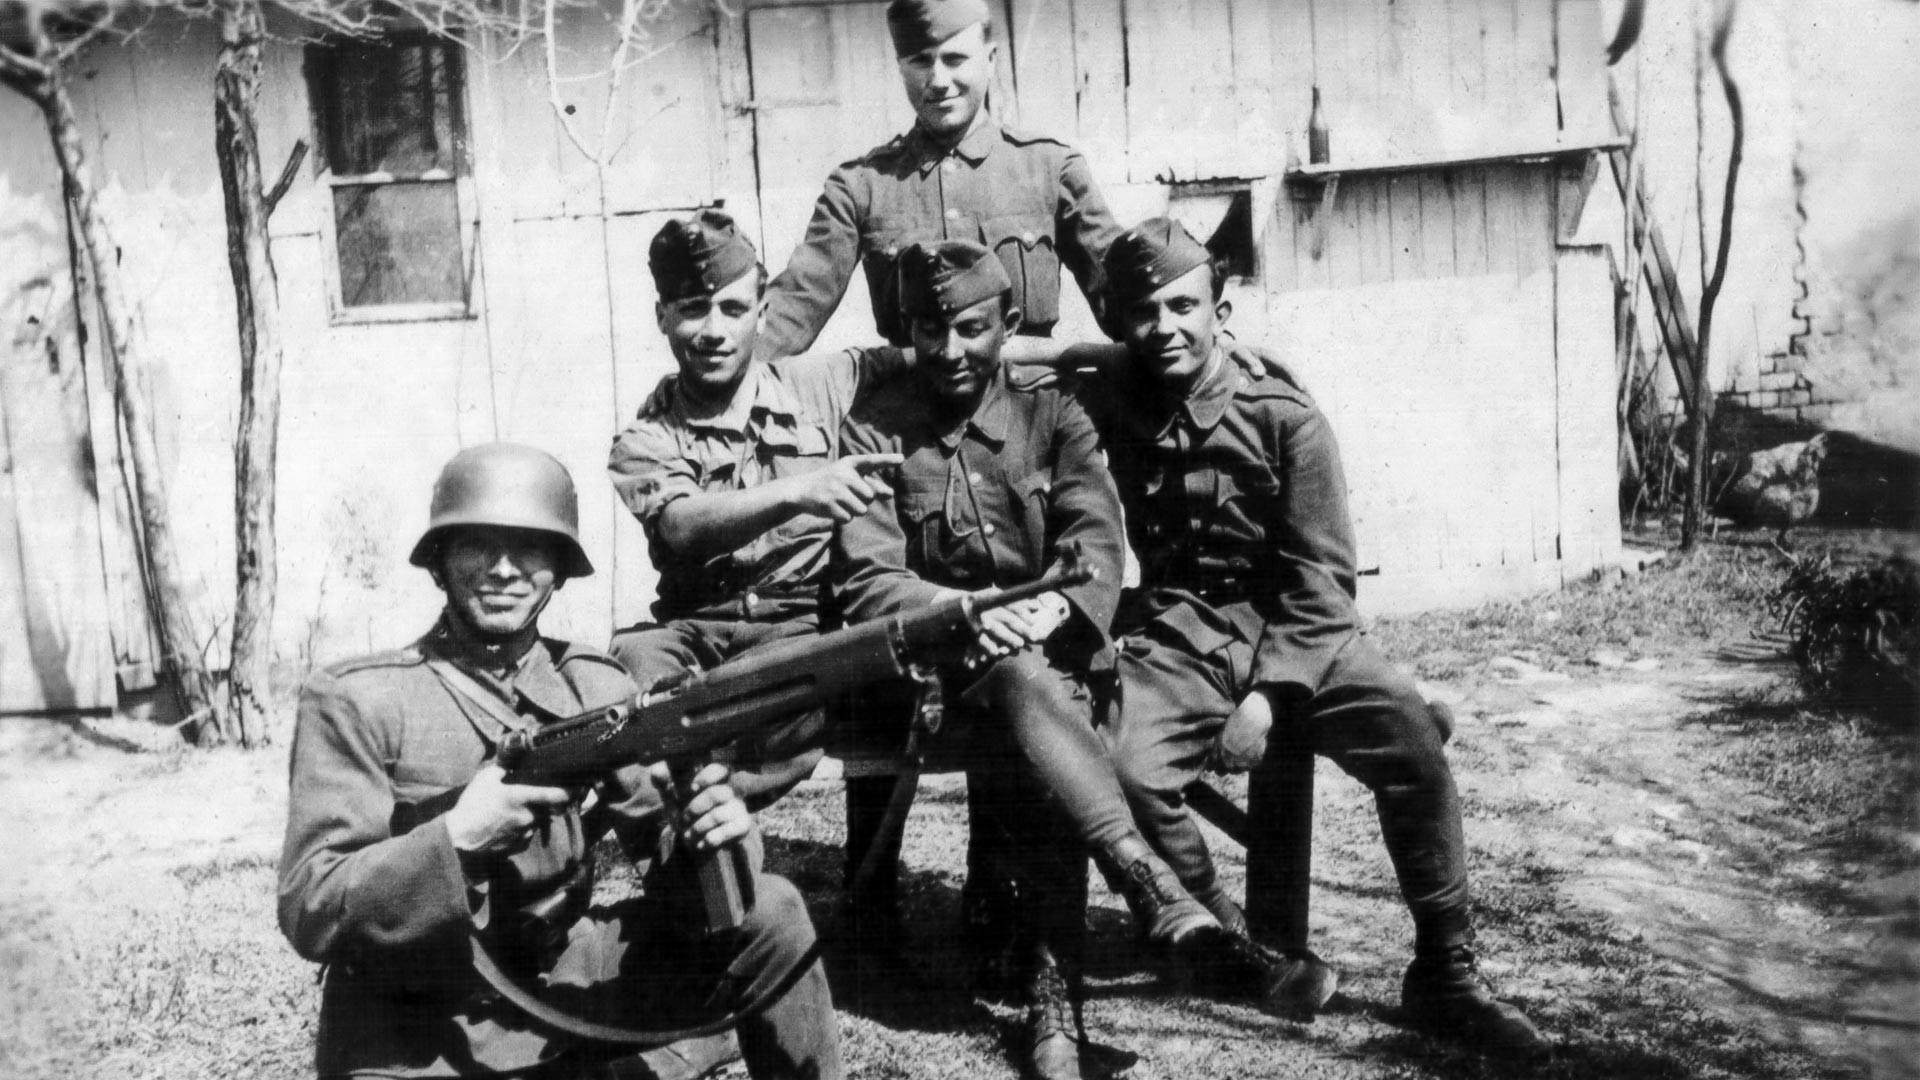 Унгарски войници в Карпатите през 1944 г.